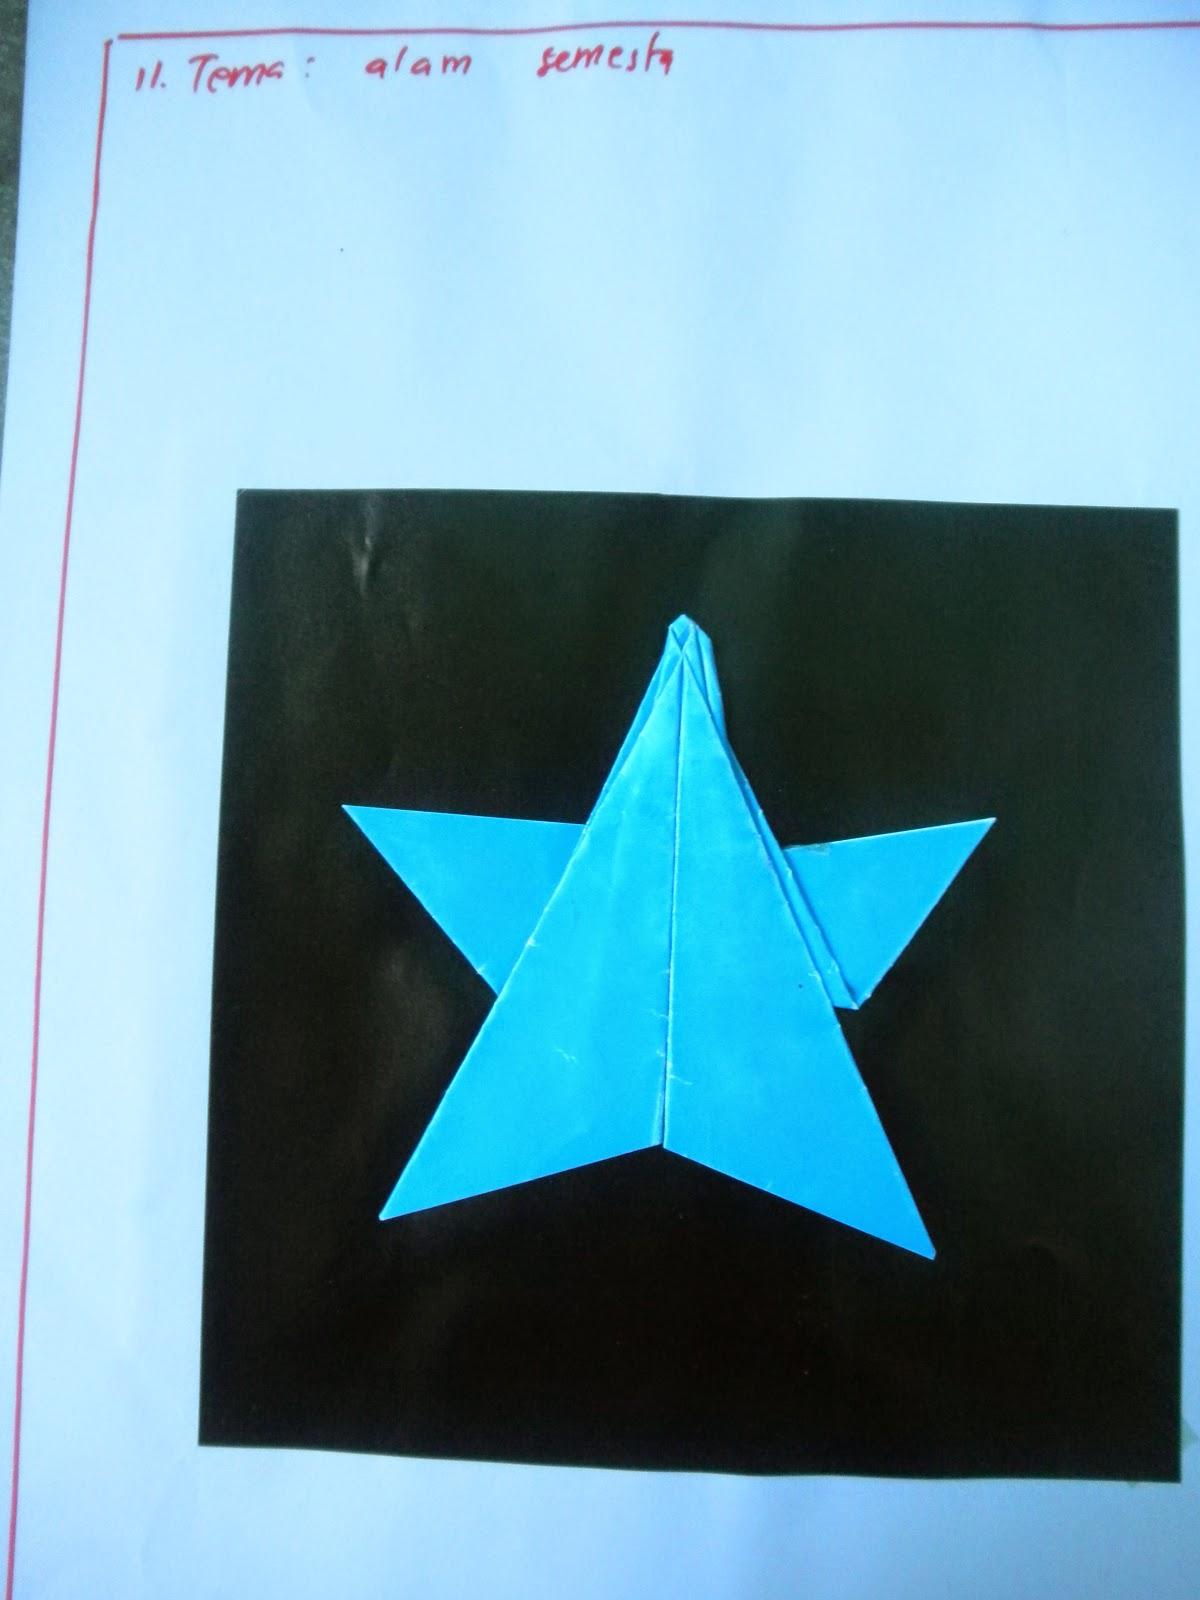 Contoh Origami Melipat Kertas Untuk Paud Berdasarkan Tema